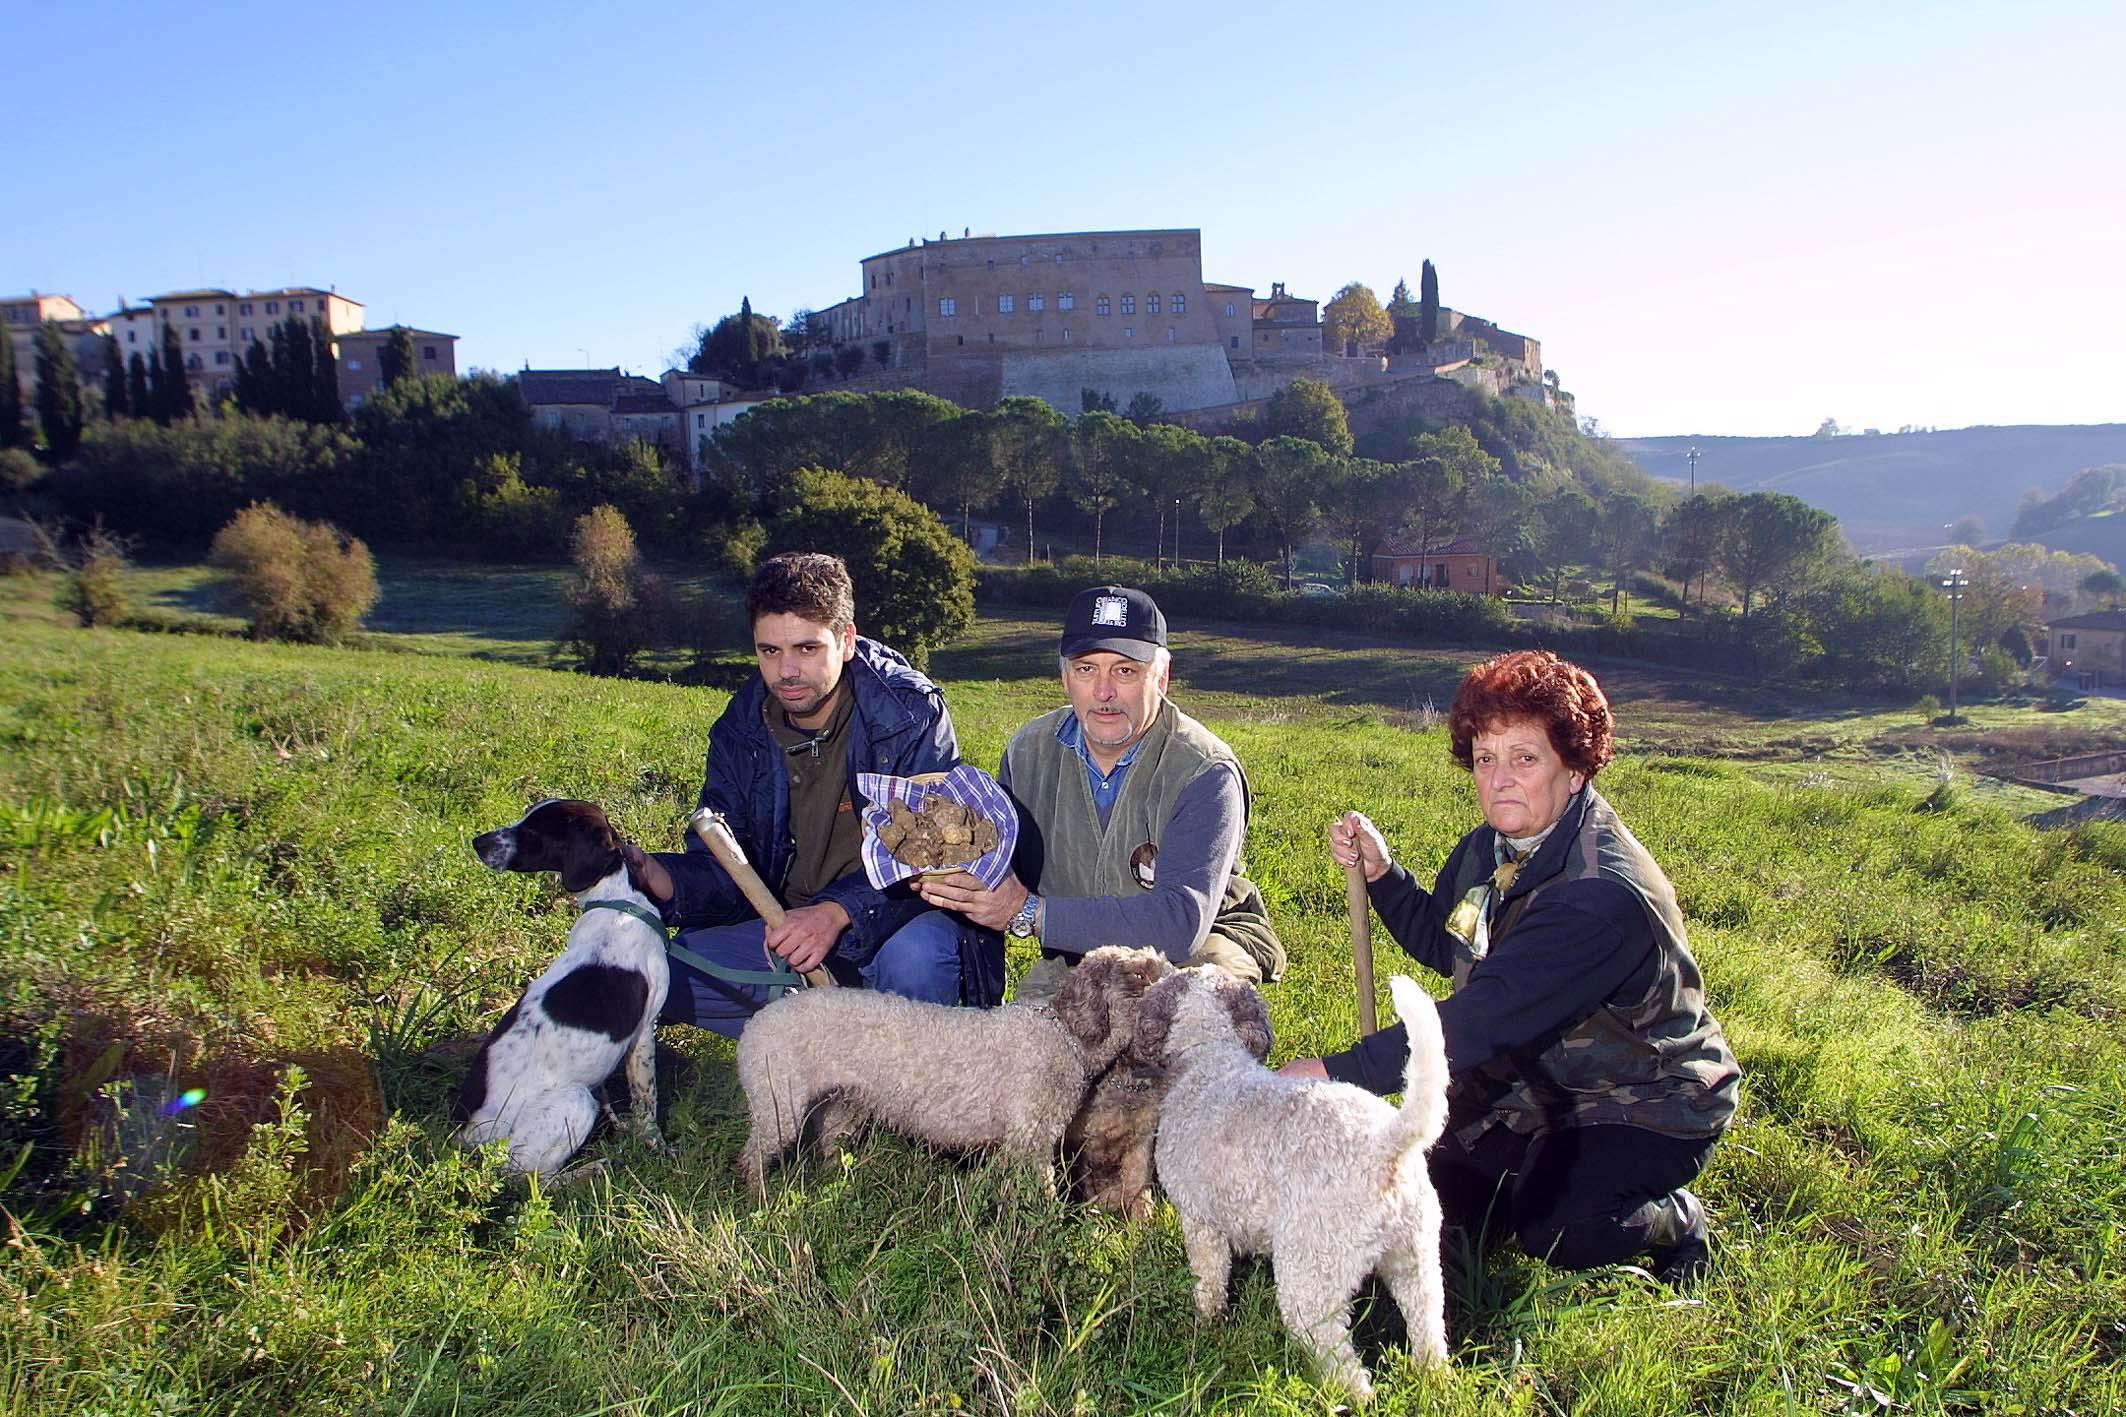 Cercatori di tartufi a San Giovanni d'Asso (Sestini)